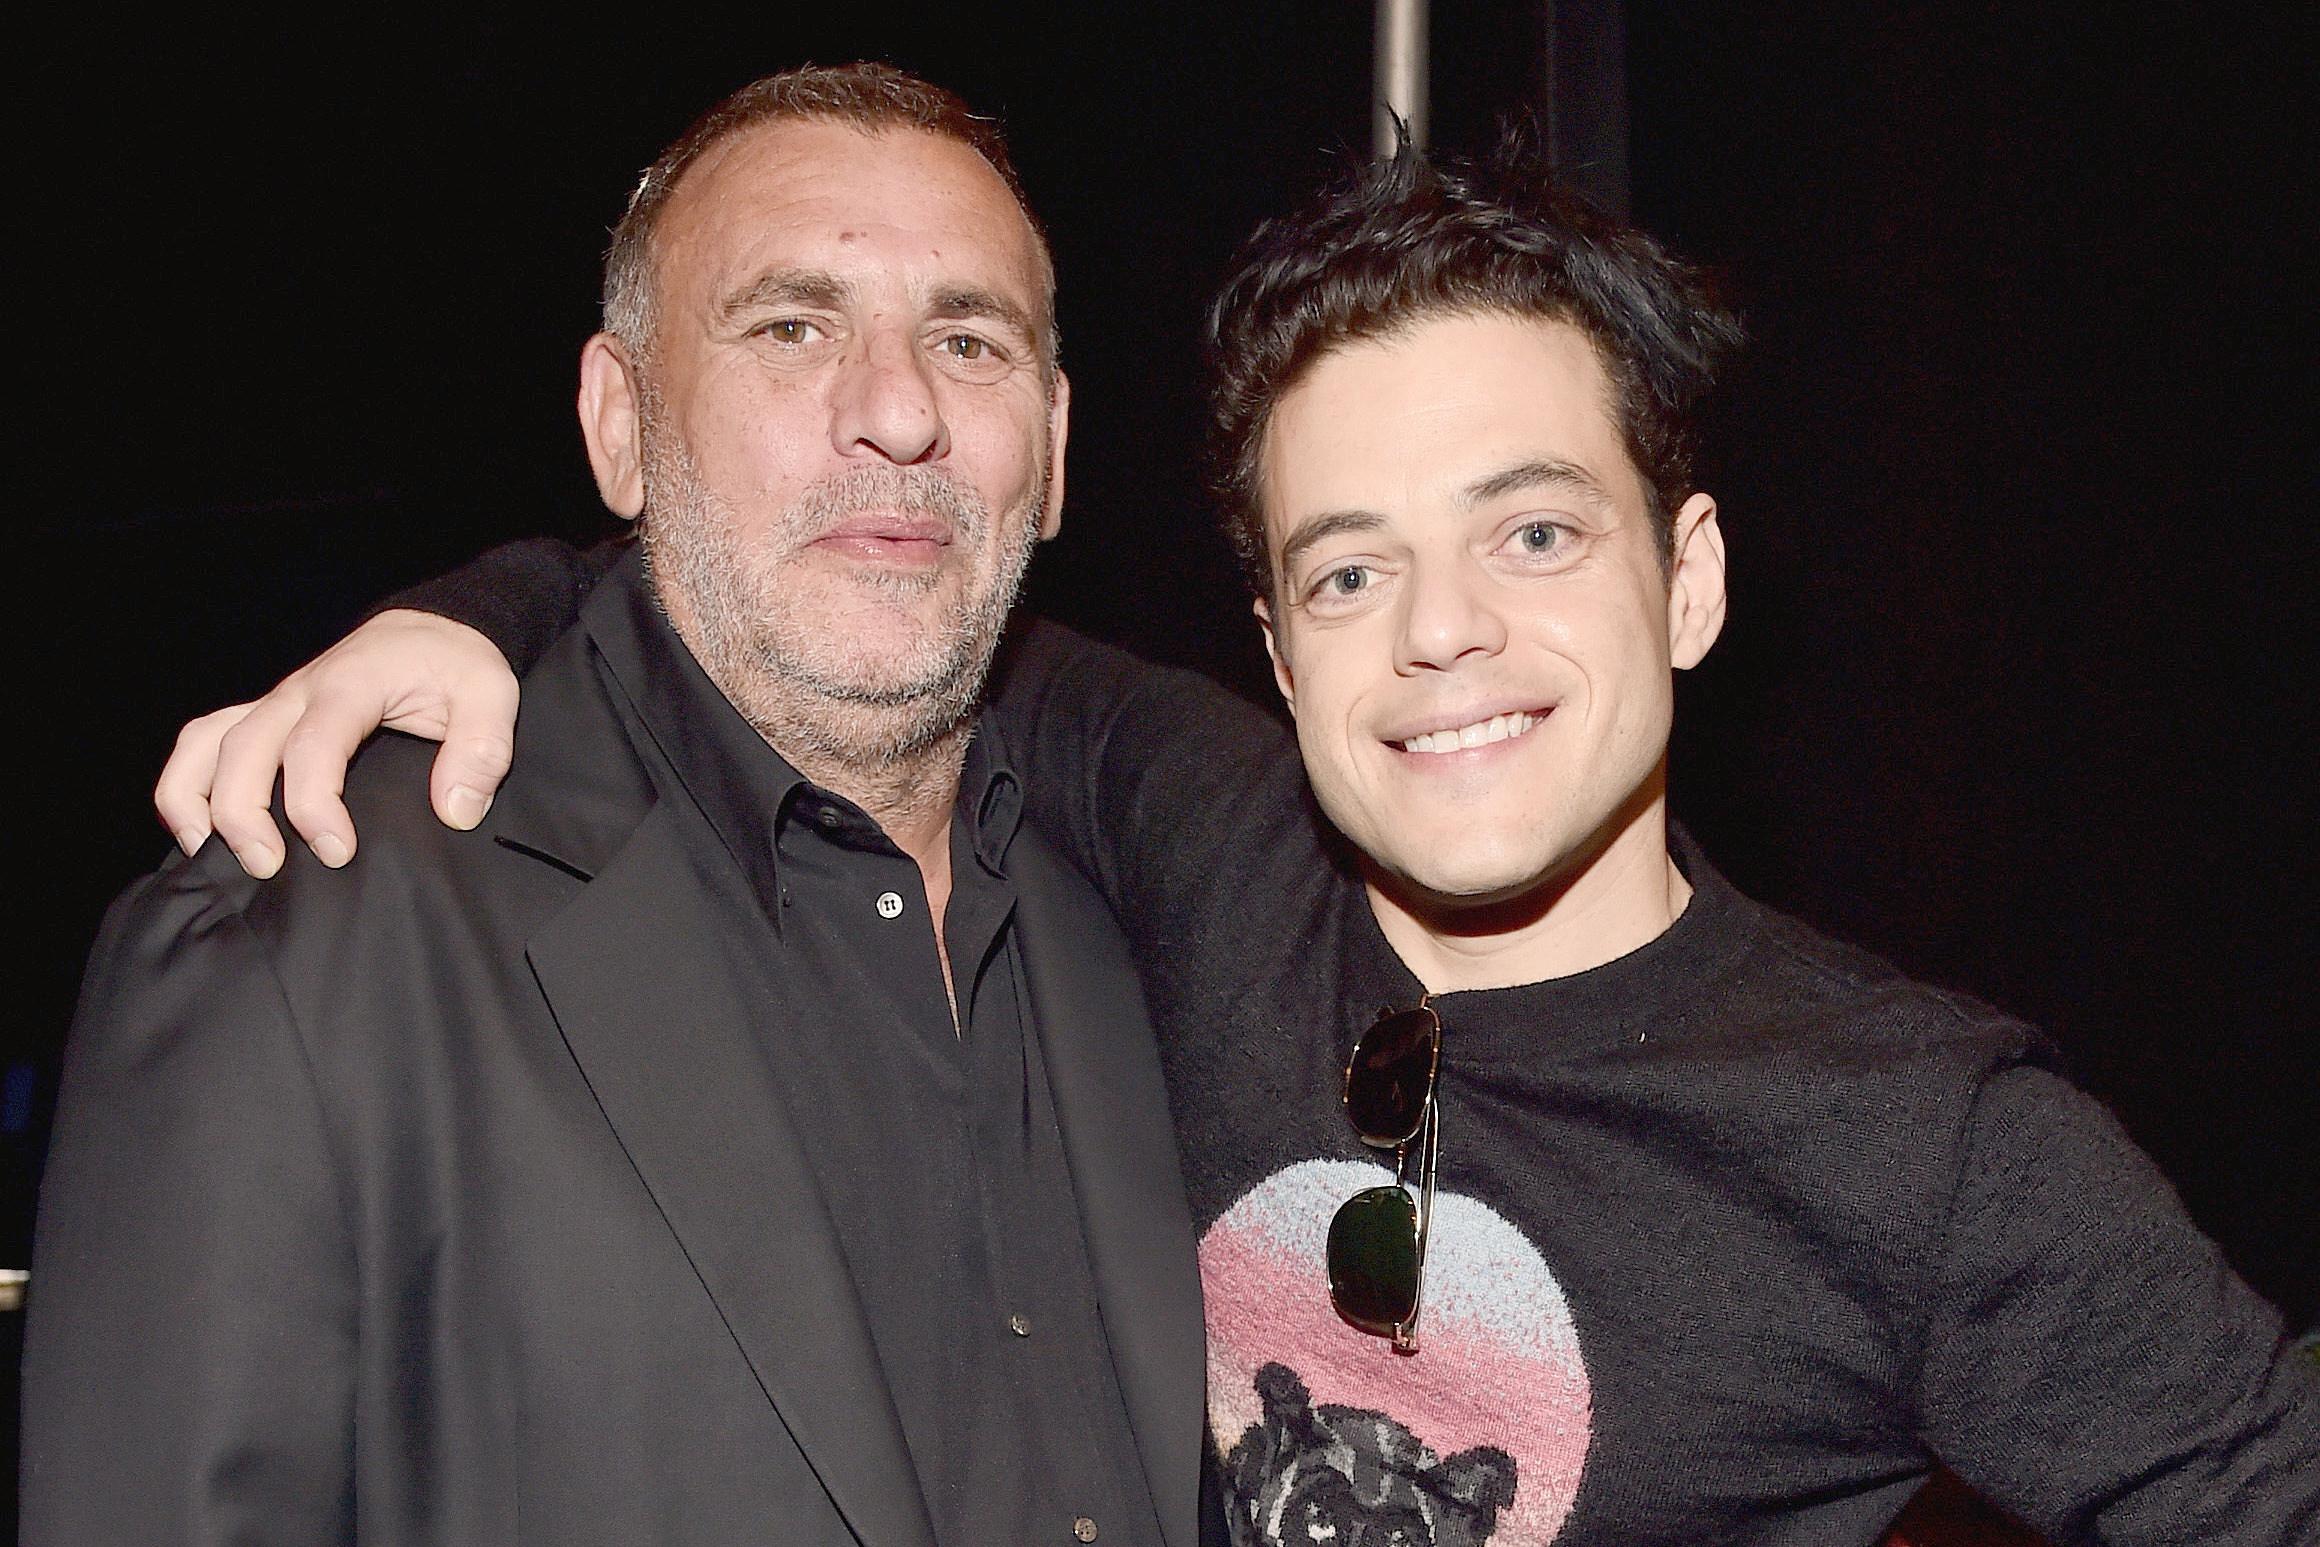 'Bohemian Rhapsody' Producer Hails Rami Malek for 'Driving Train' Through Director's Firing